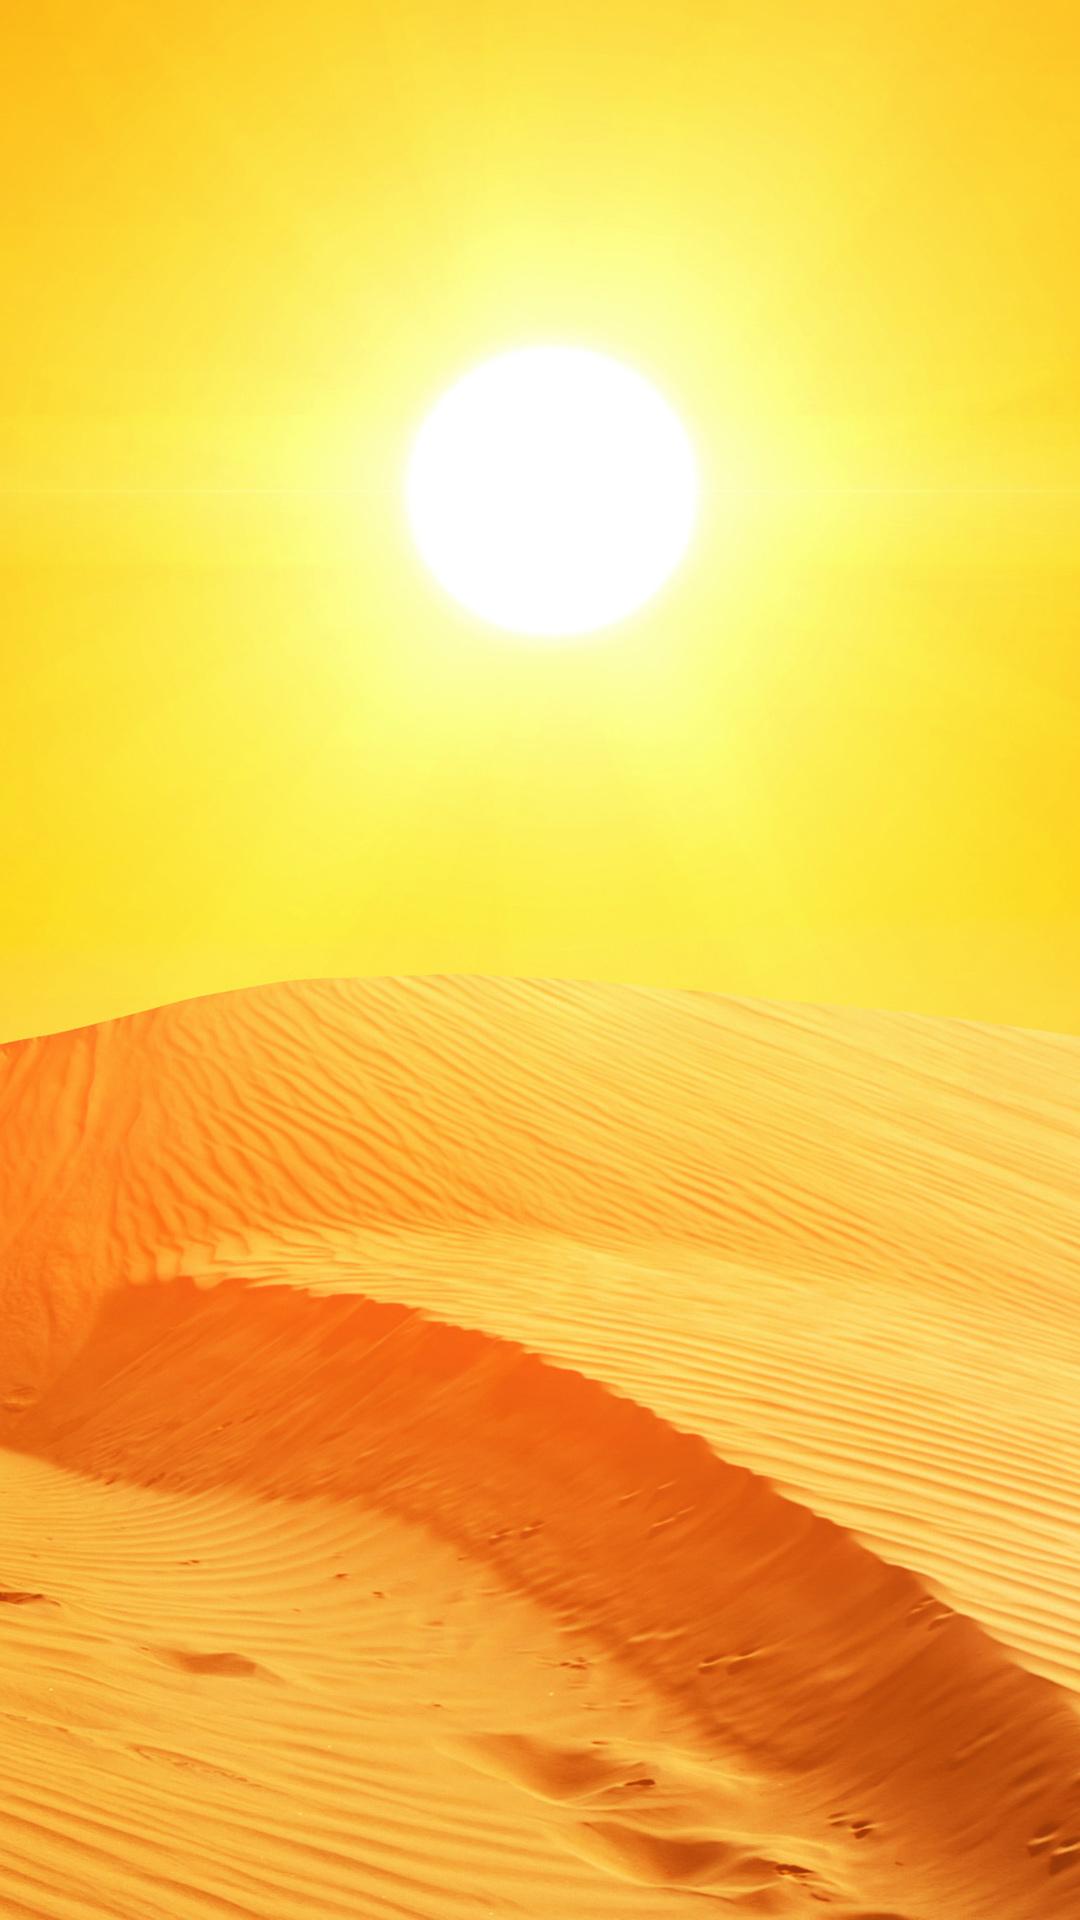 Iphone s plus wallpaper. Desert clipart desert sun